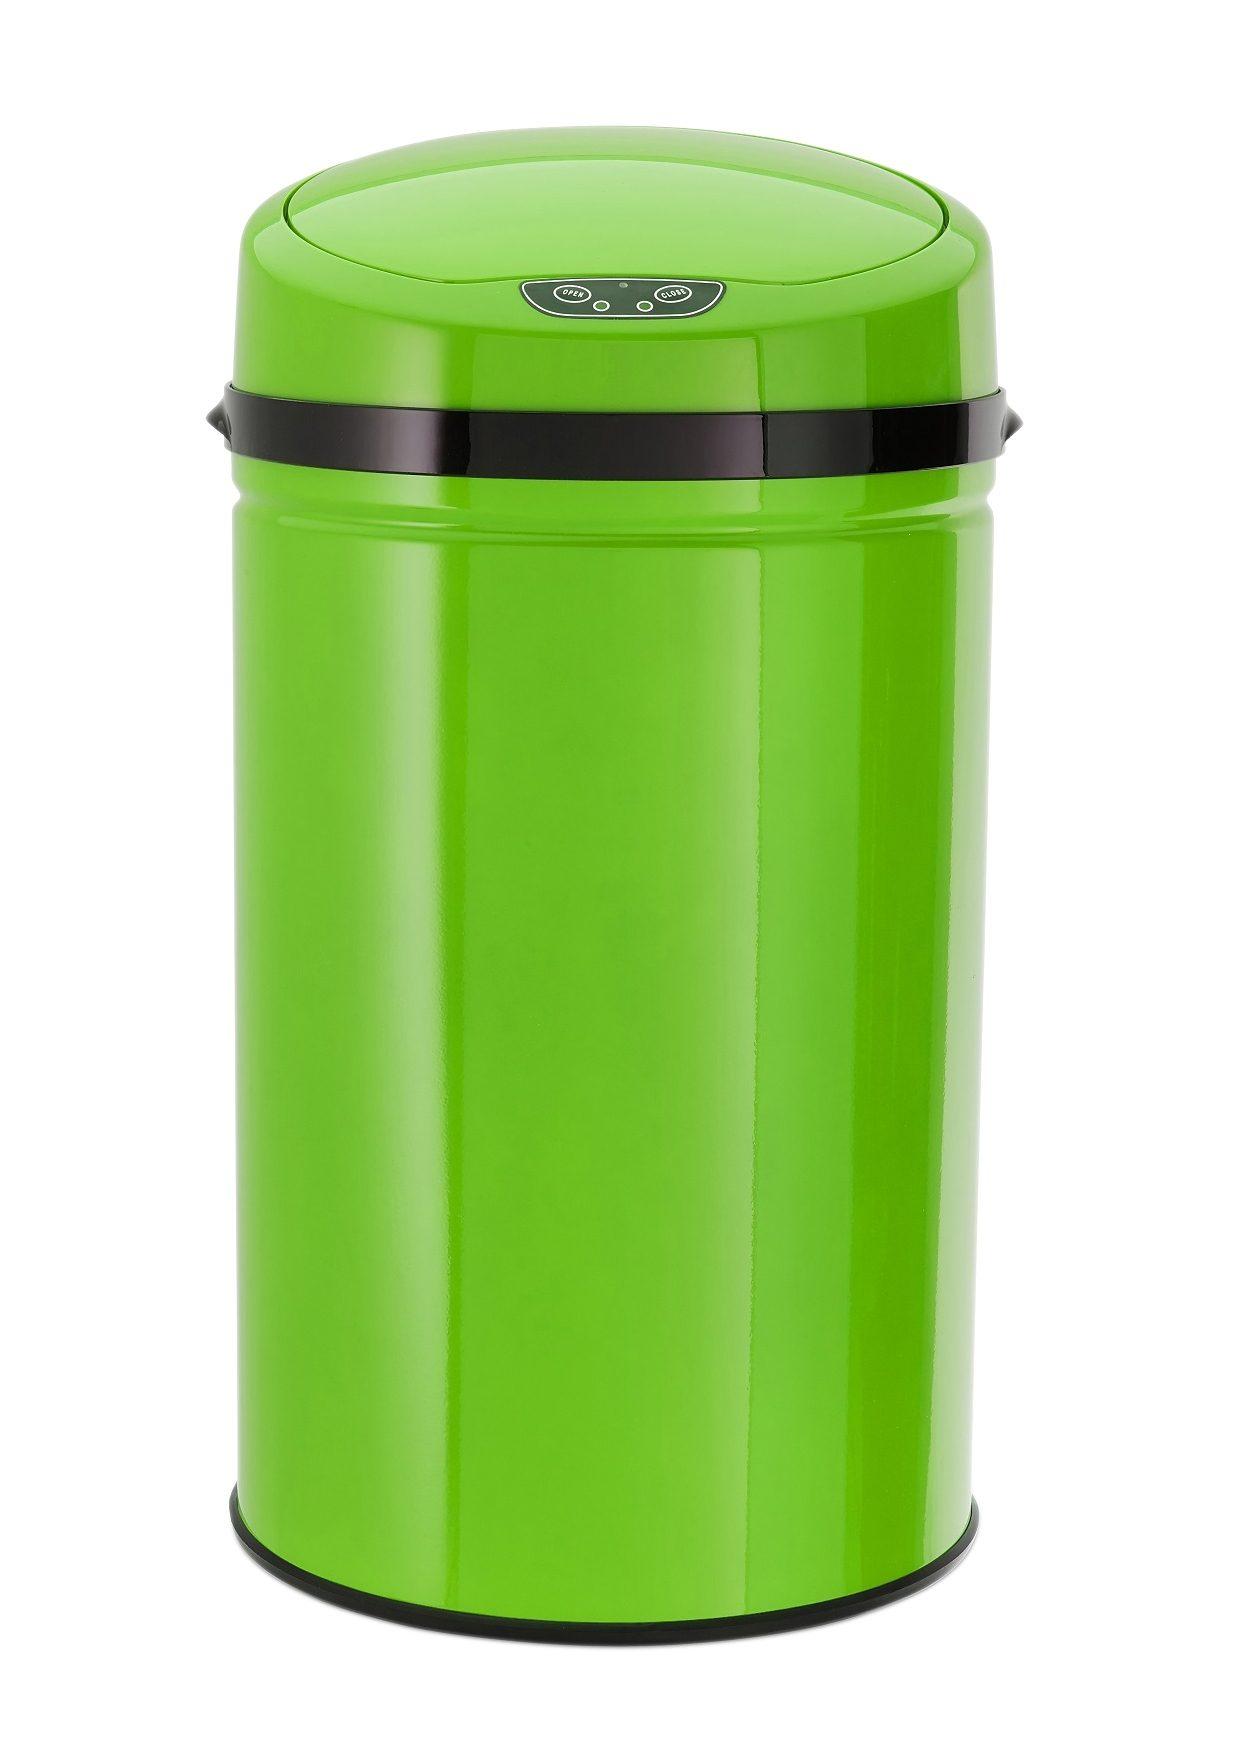 Edelstahl-Abfalleimer mit Infrarotsensor, 30 Liter, »INOX LEMON«, Echtwerk